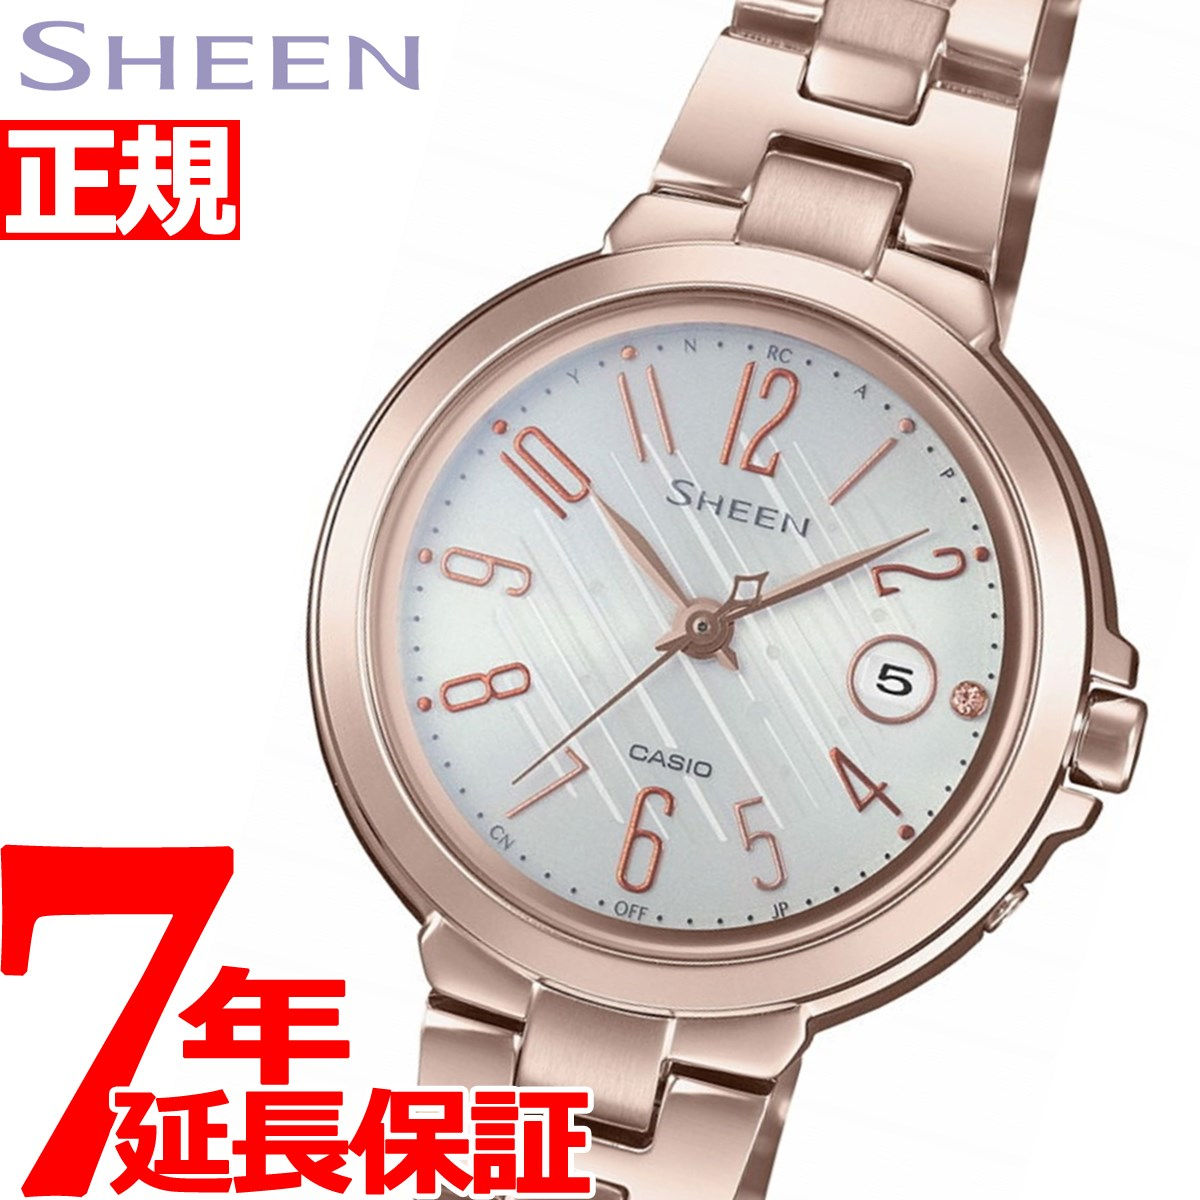 12b4c19283 カシオシーンCASIOSHEEN電波ソーラー電波時計腕時計レディースSHW-5100CG-7AJF【2018